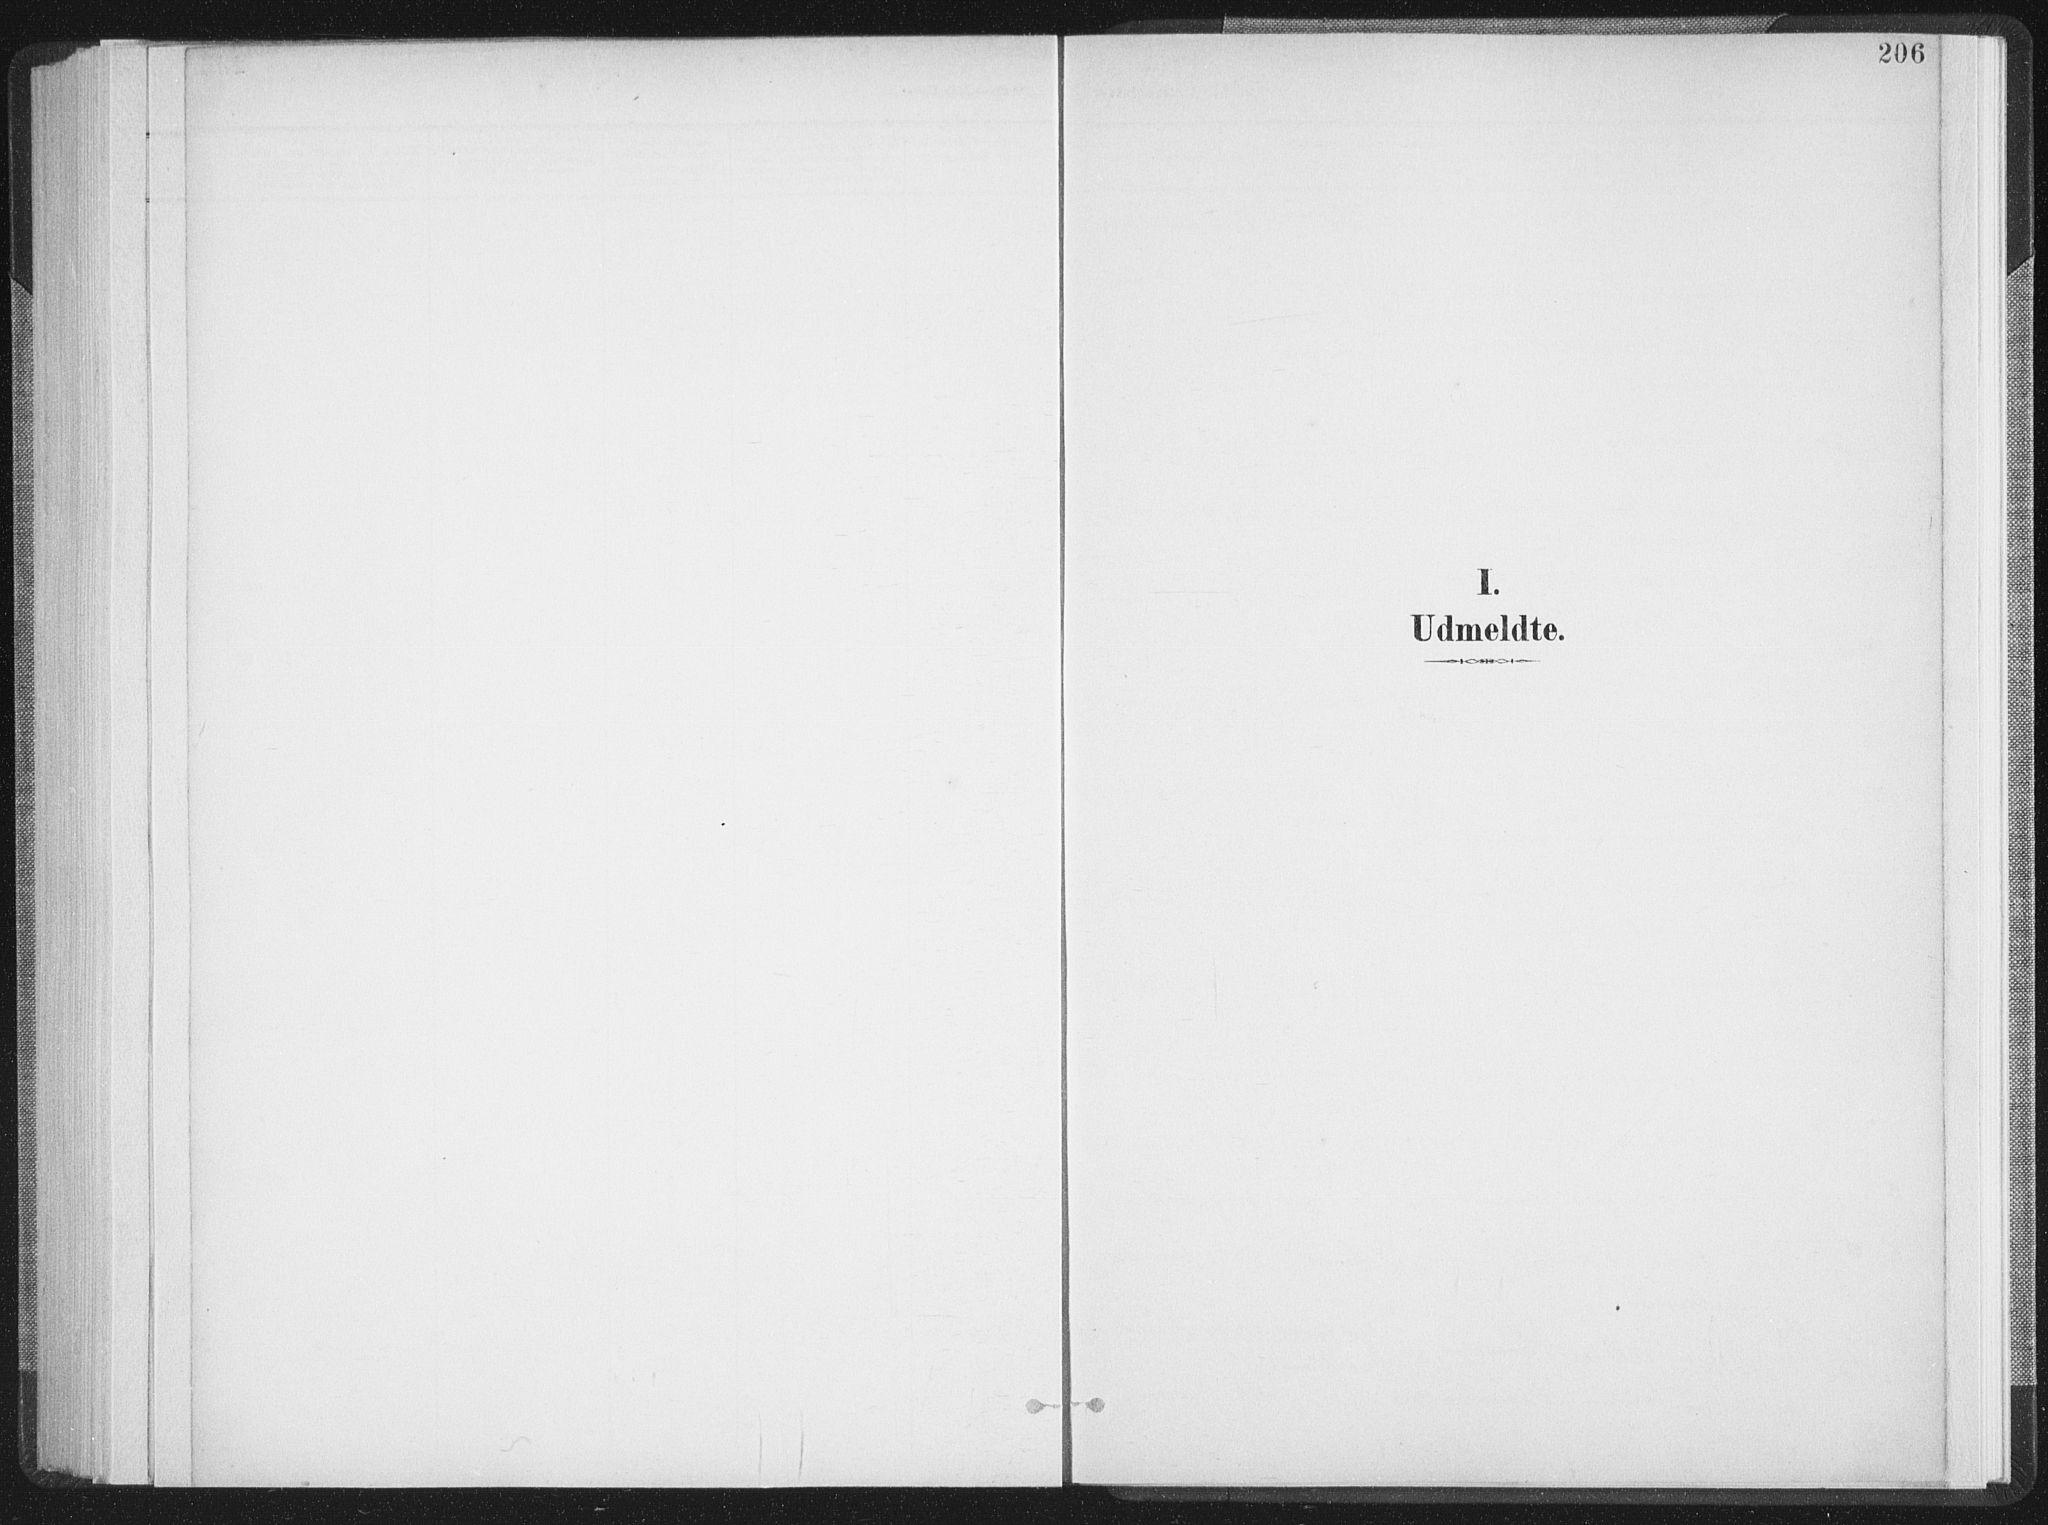 SAT, Ministerialprotokoller, klokkerbøker og fødselsregistre - Nordland, 897/L1400: Ministerialbok nr. 897A07, 1897-1908, s. 206